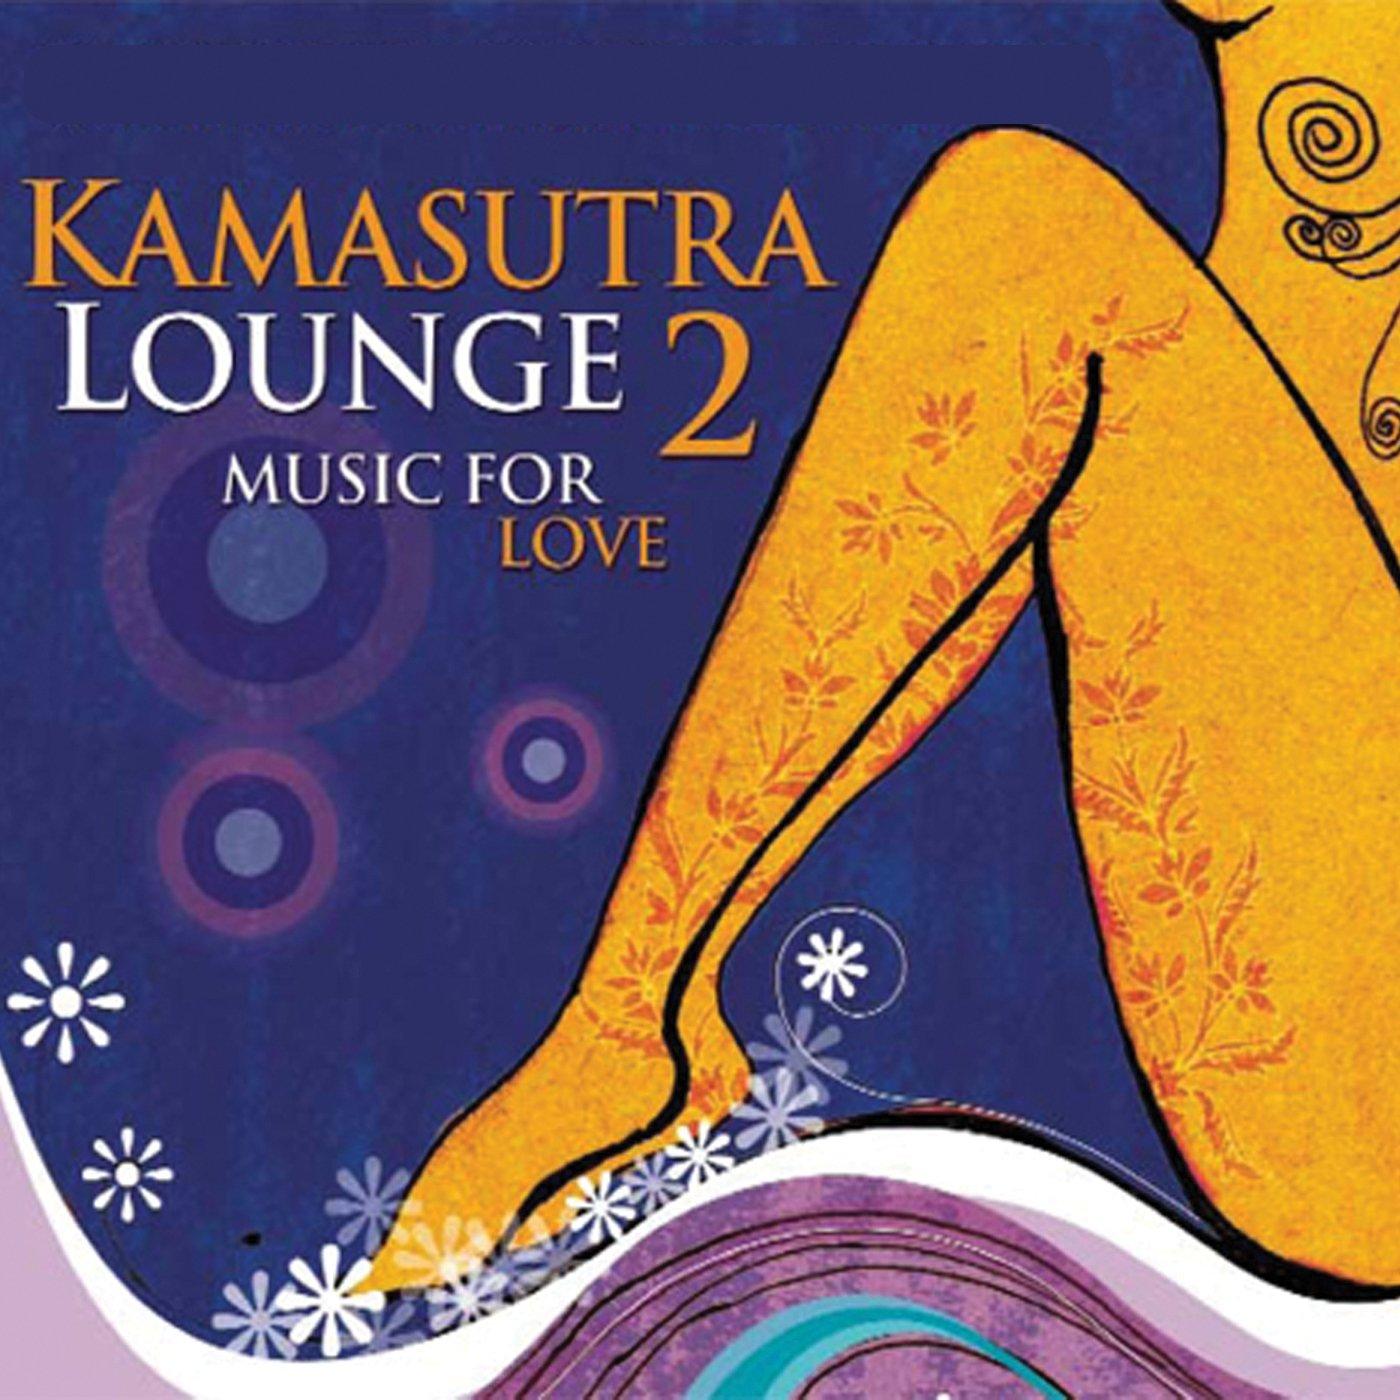 Kamasutra Lounge 2